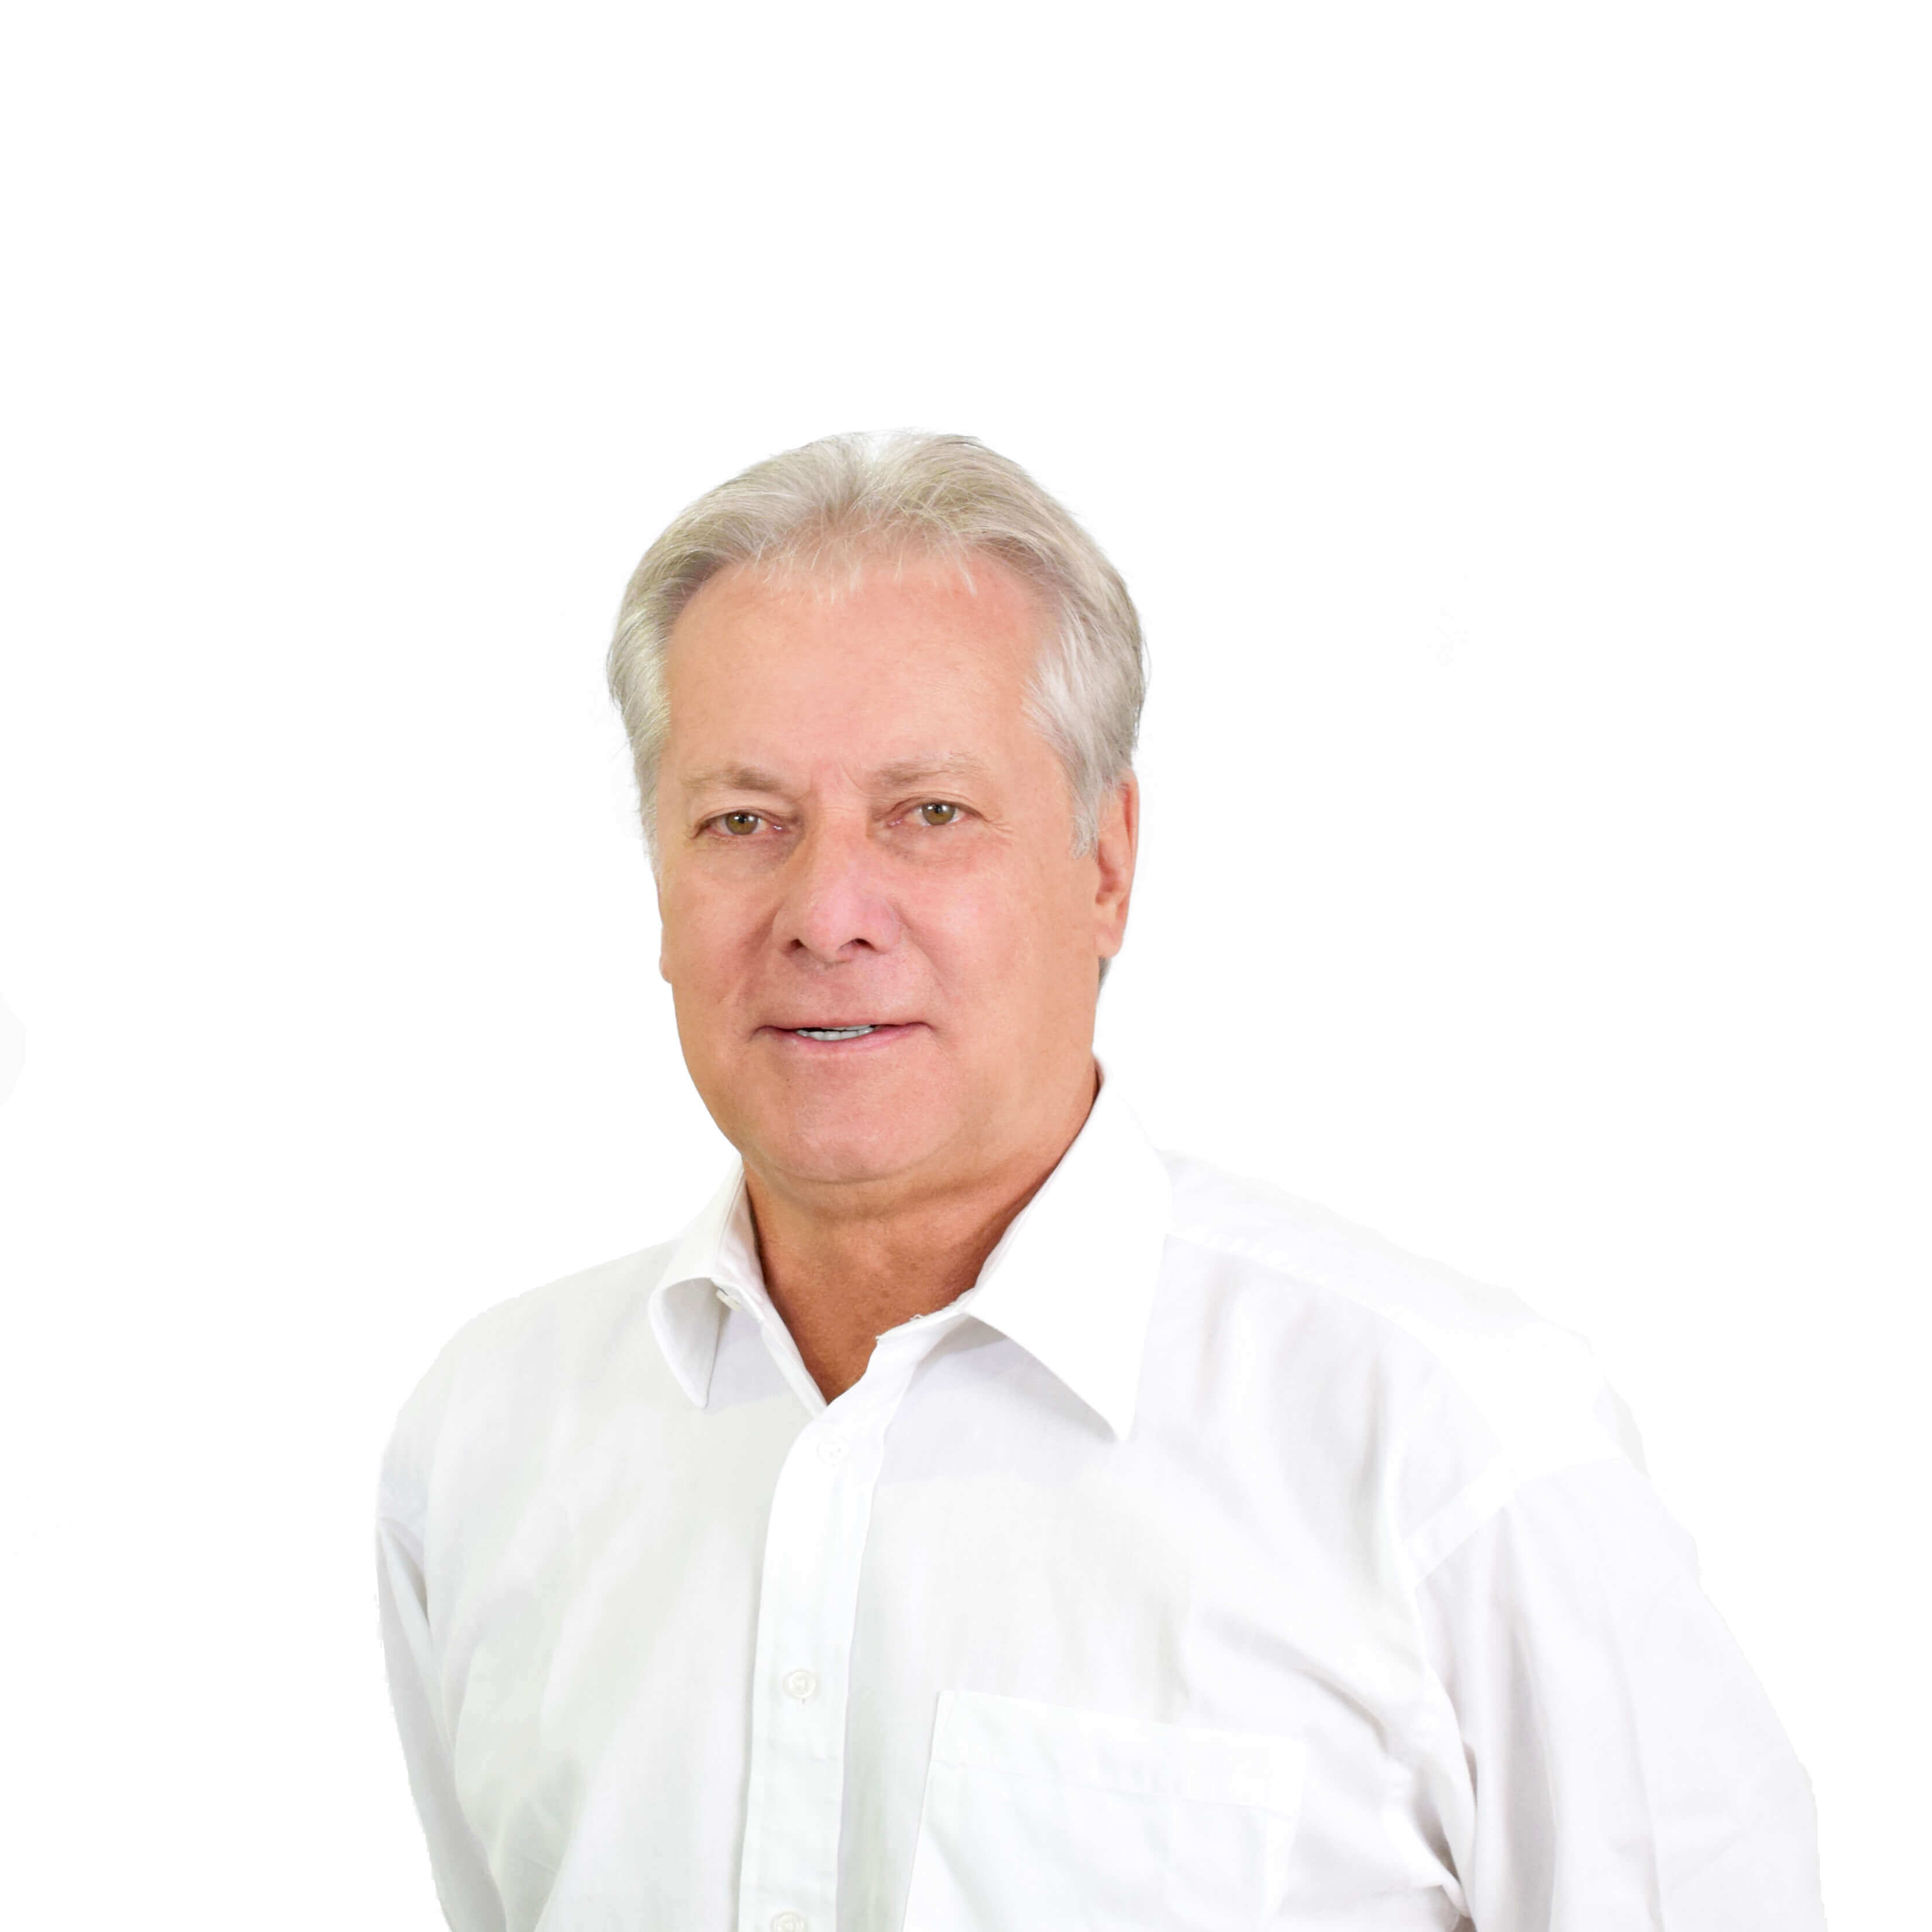 russel-fedun-profile-picture